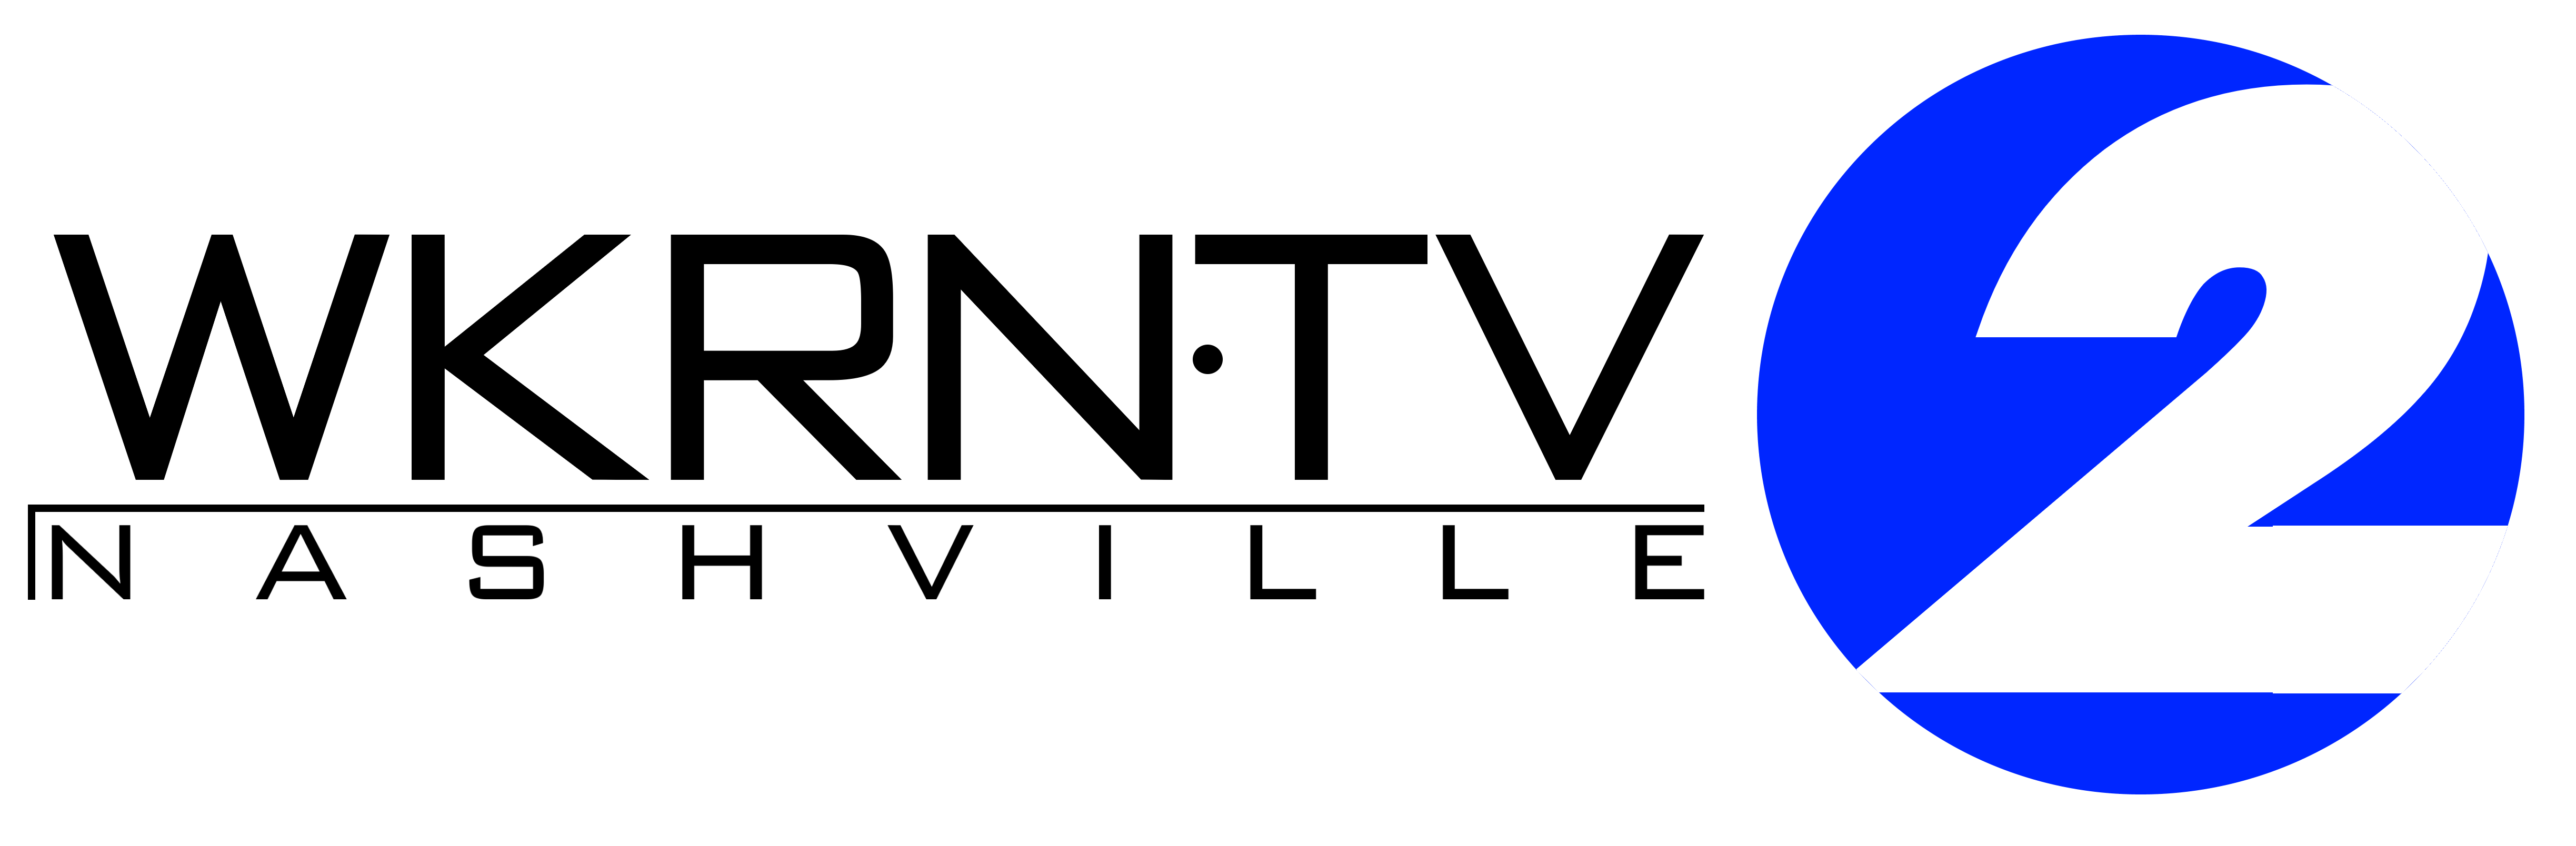 AlternateHistory.com's WKRN logo #2.png